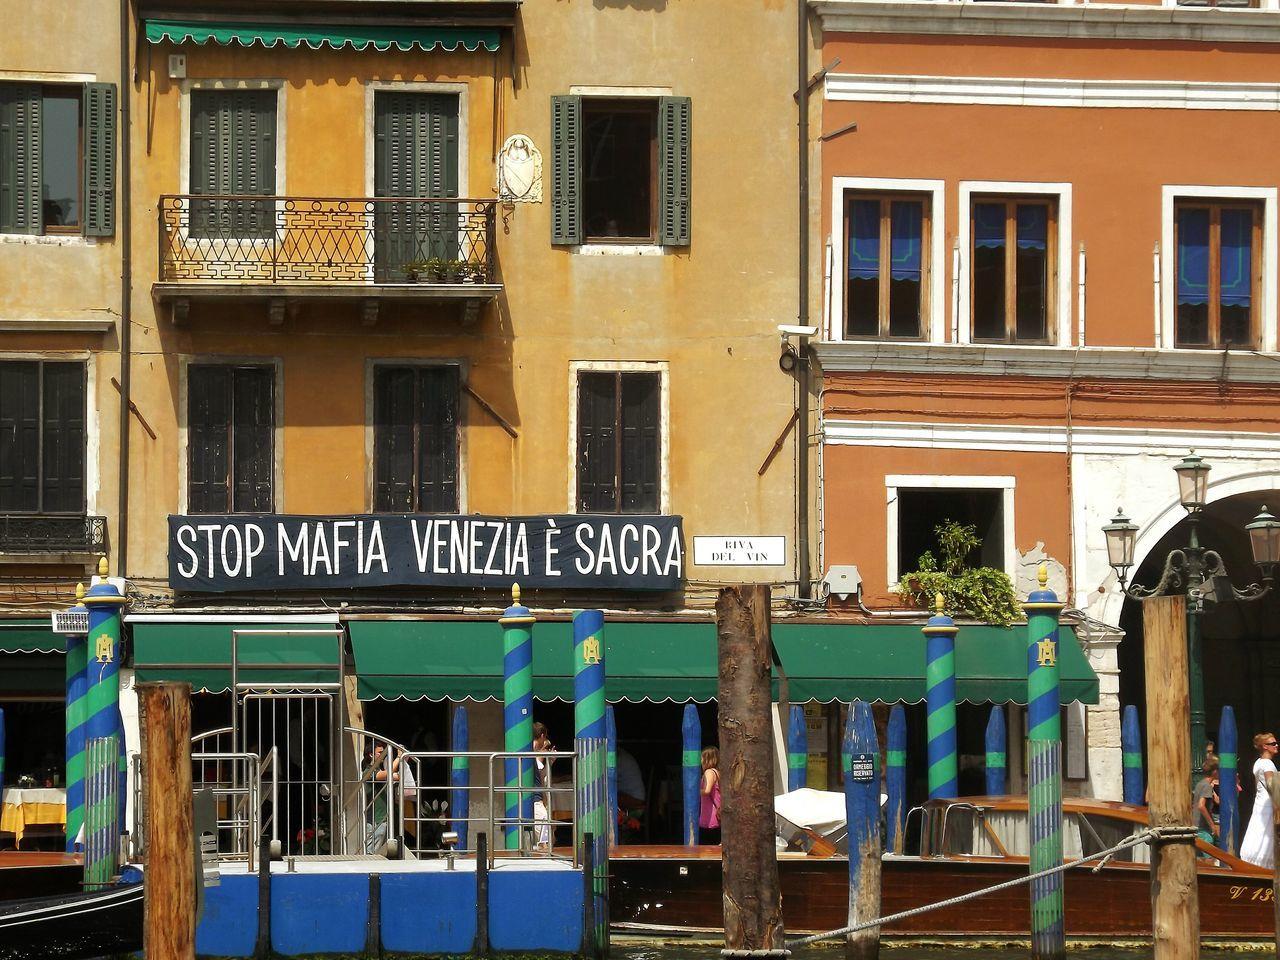 Venezia Venice Italy Italia Message Mafia  Colors Building Exterior Outdoors Text